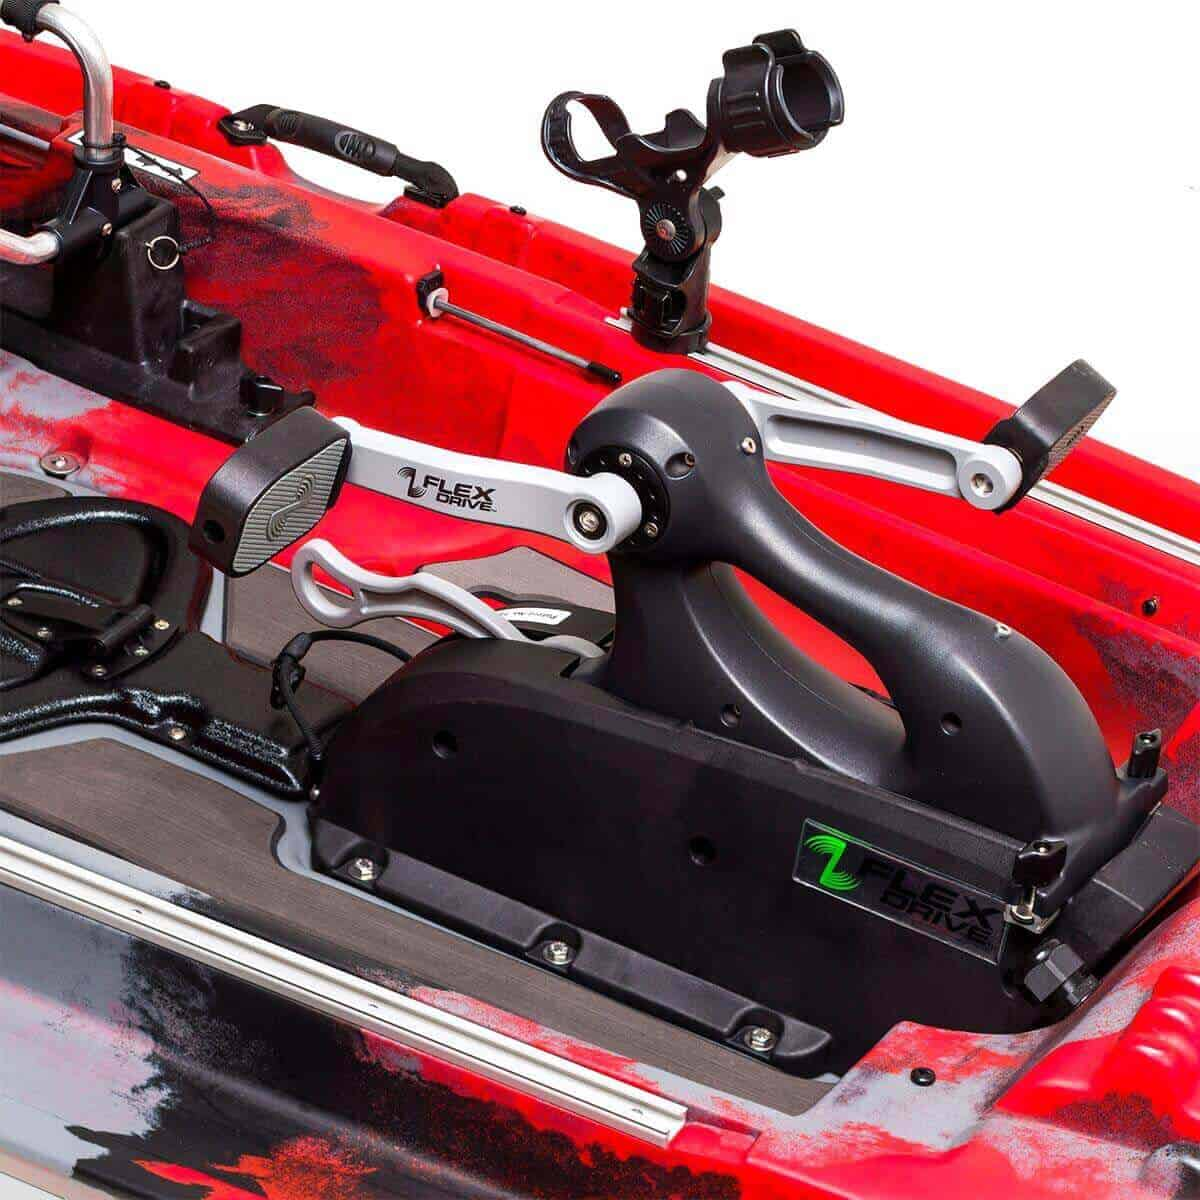 The Flex Drive 3D Pedal Drive Pod and YakAttack Omega Rod on the Jackson Kayak Big Rig FD fishing kayak.